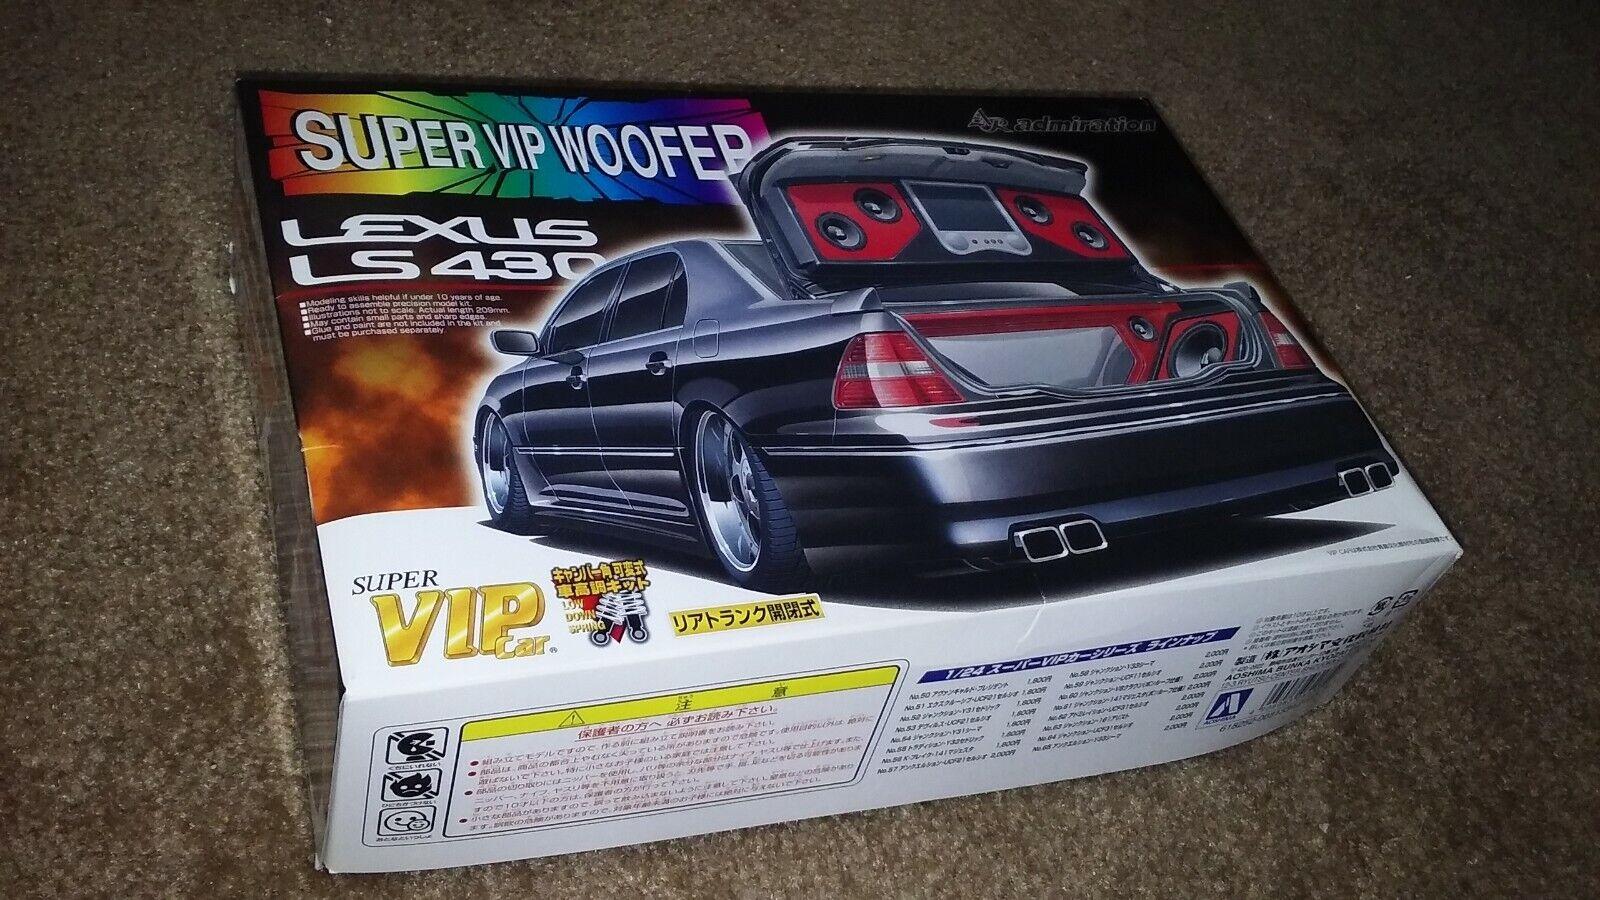 1   24 súper vip auto Series sp12 Lexus ls460 soprano kits